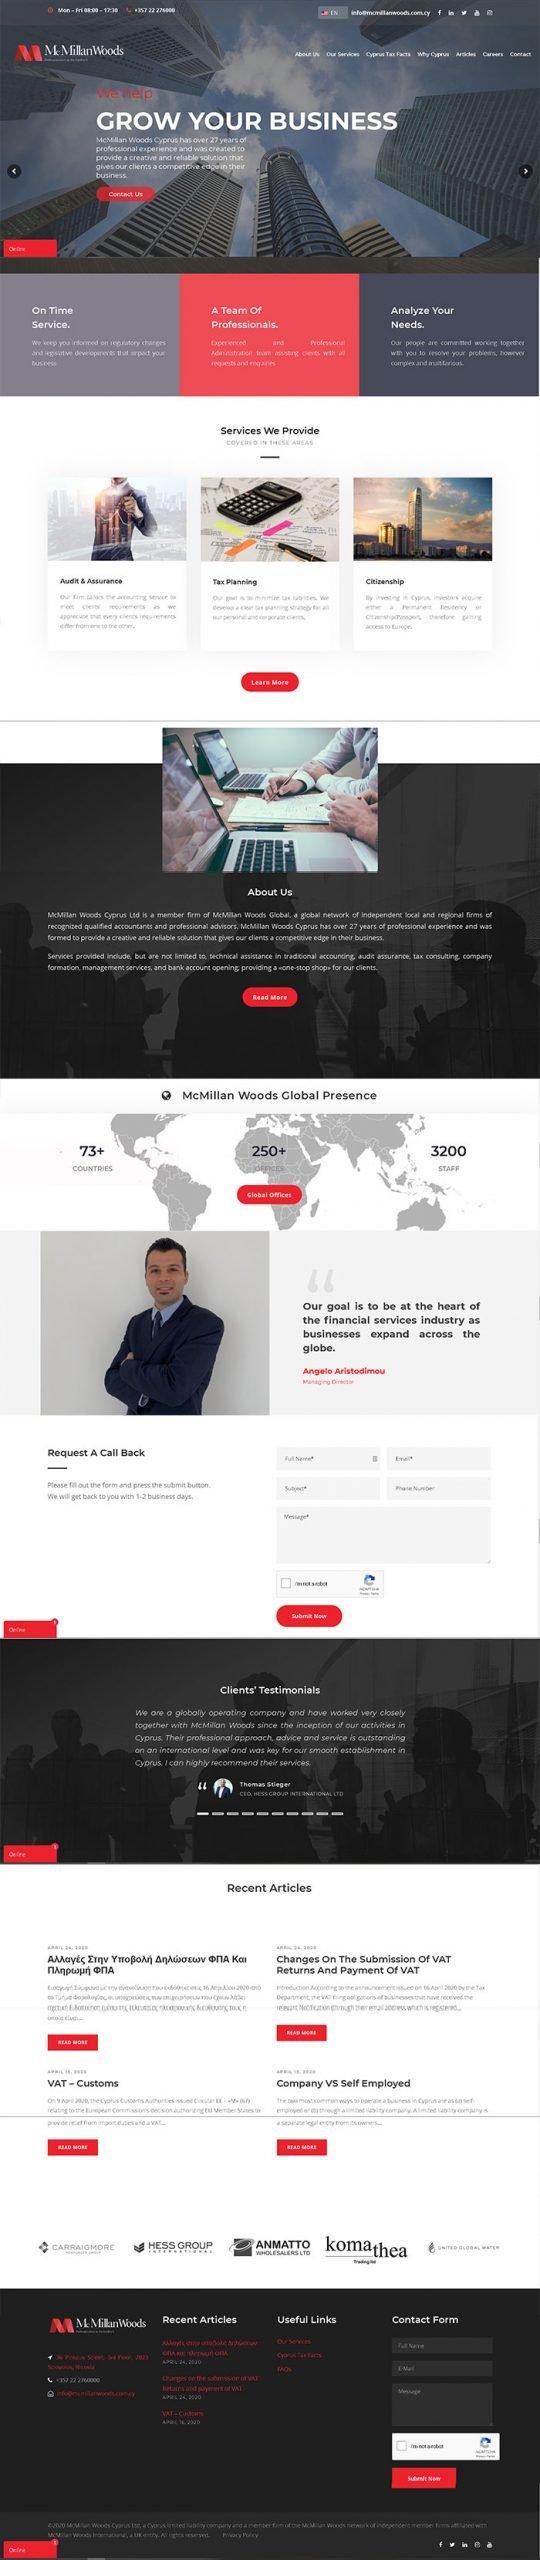 McMillan Woods website mockup